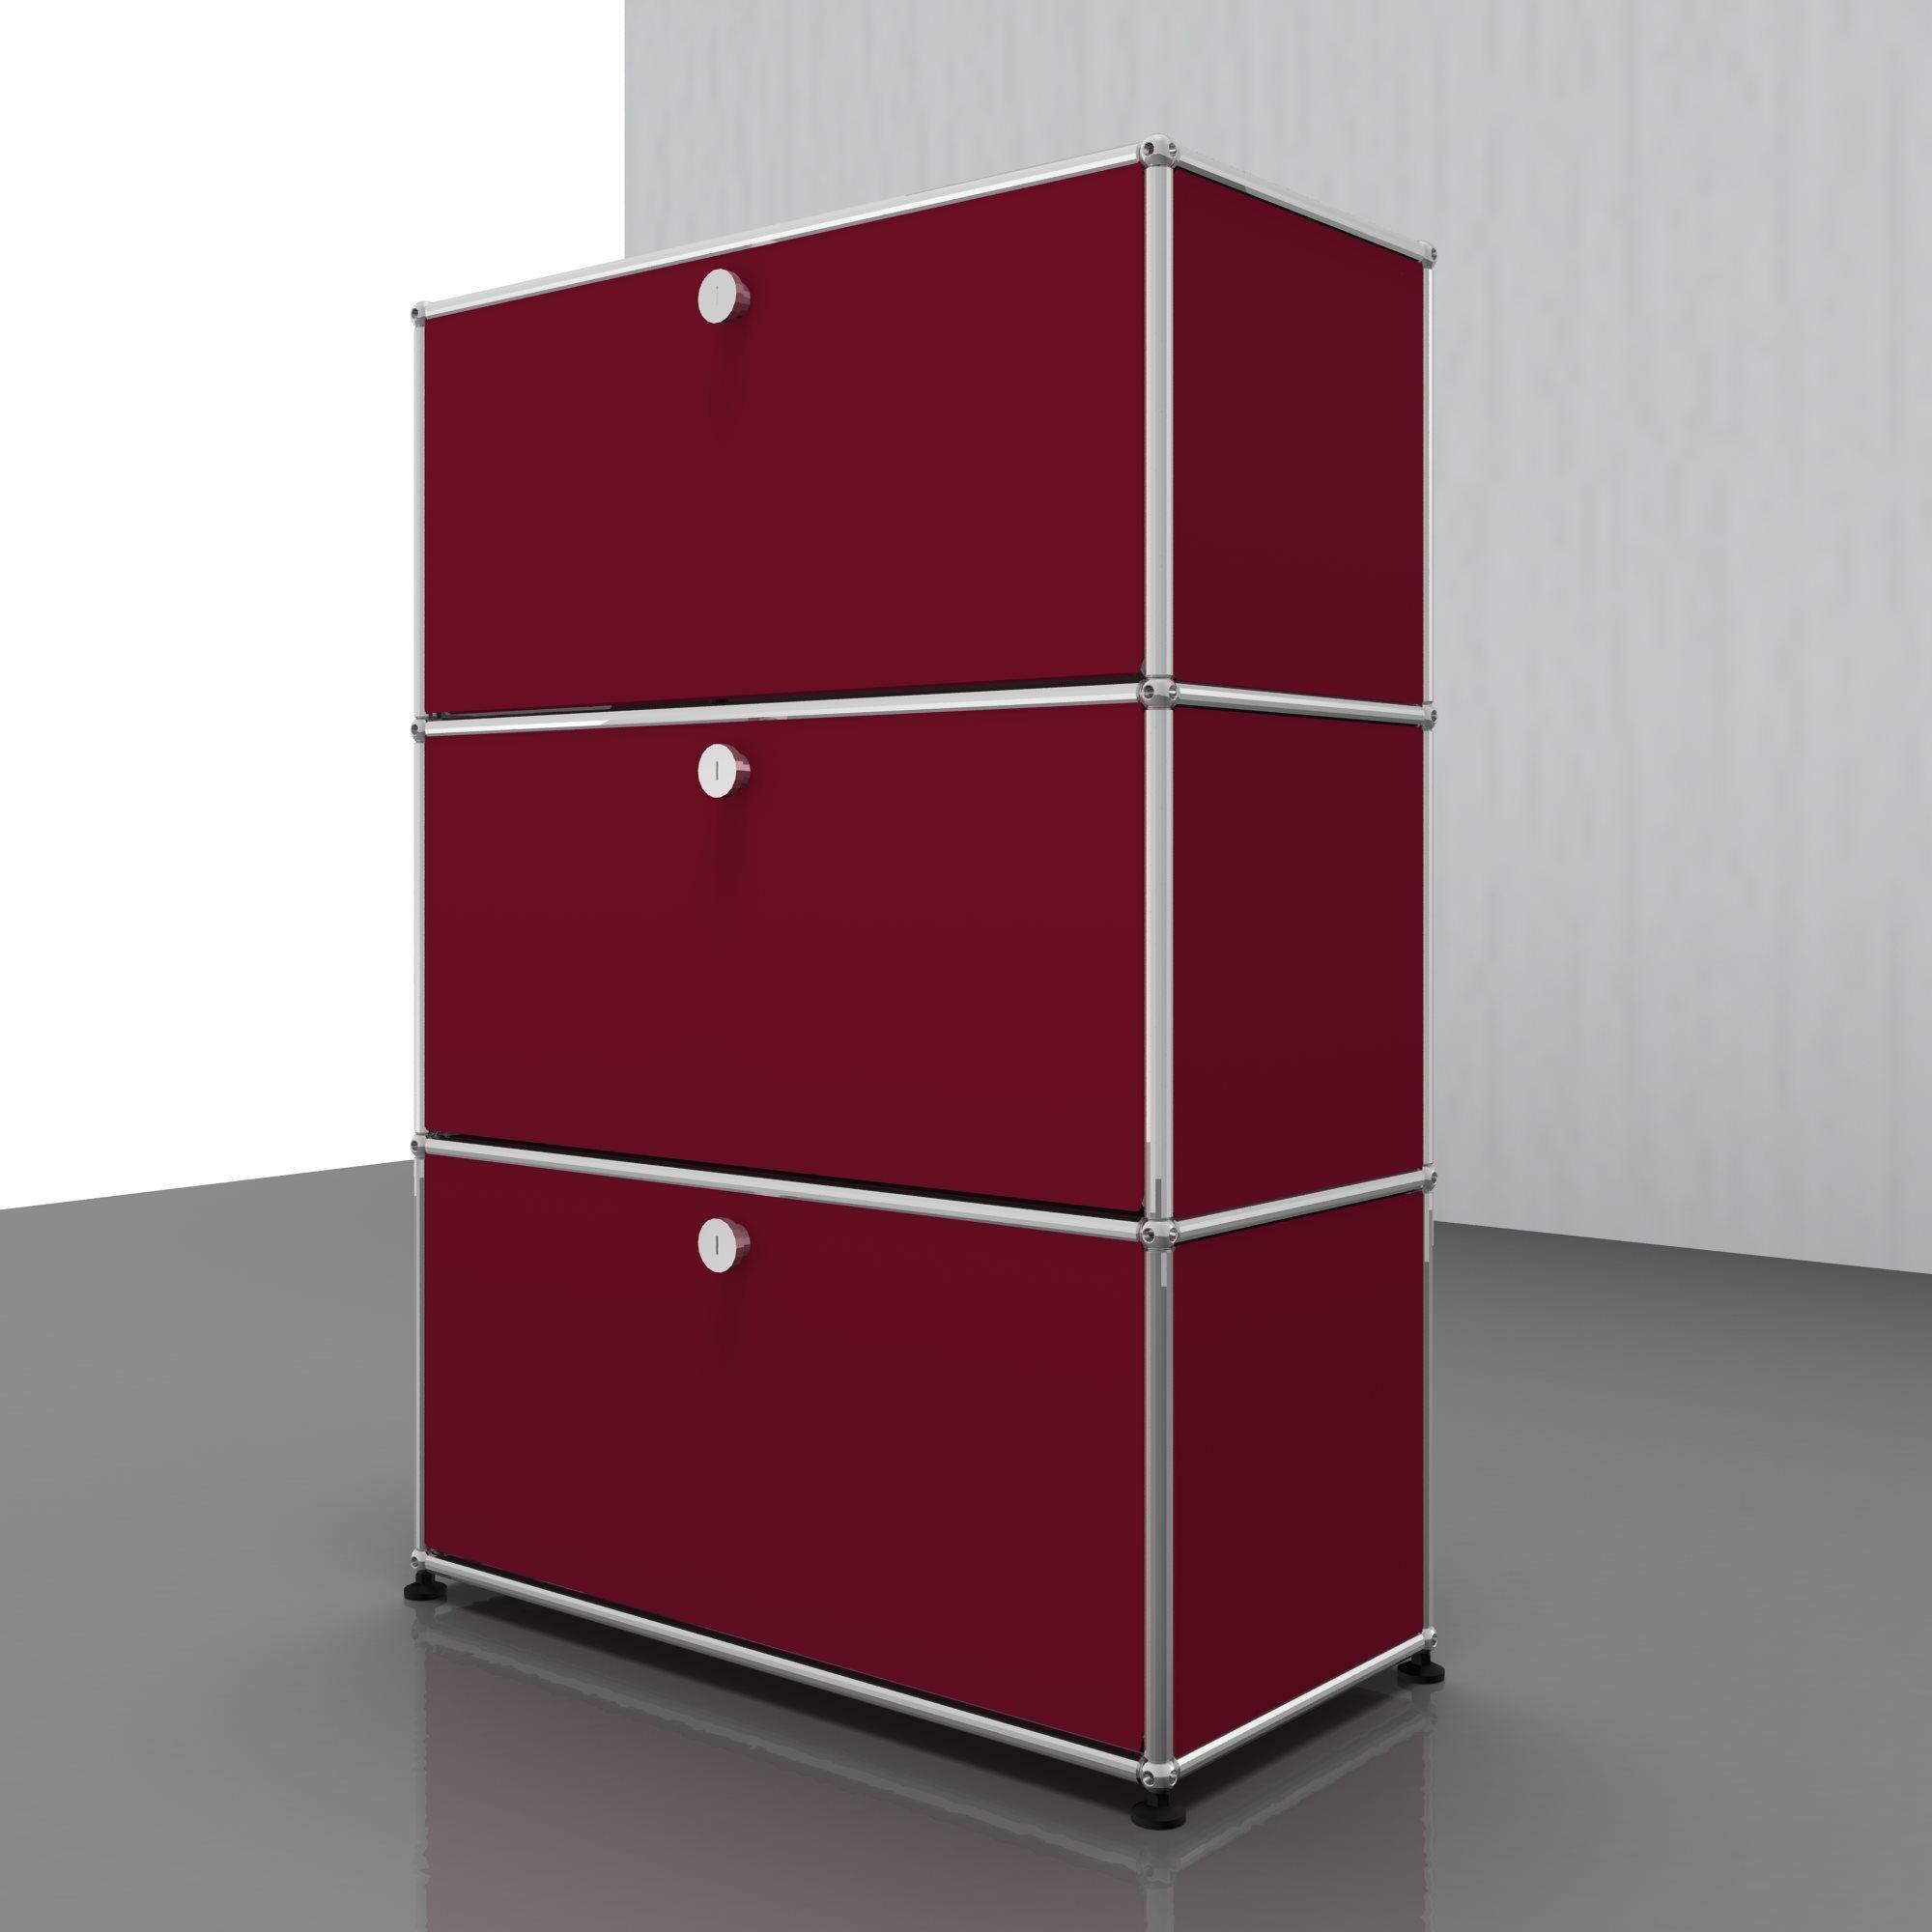 USM Haller Kommode – QUICK SHIP-USM rubinrot